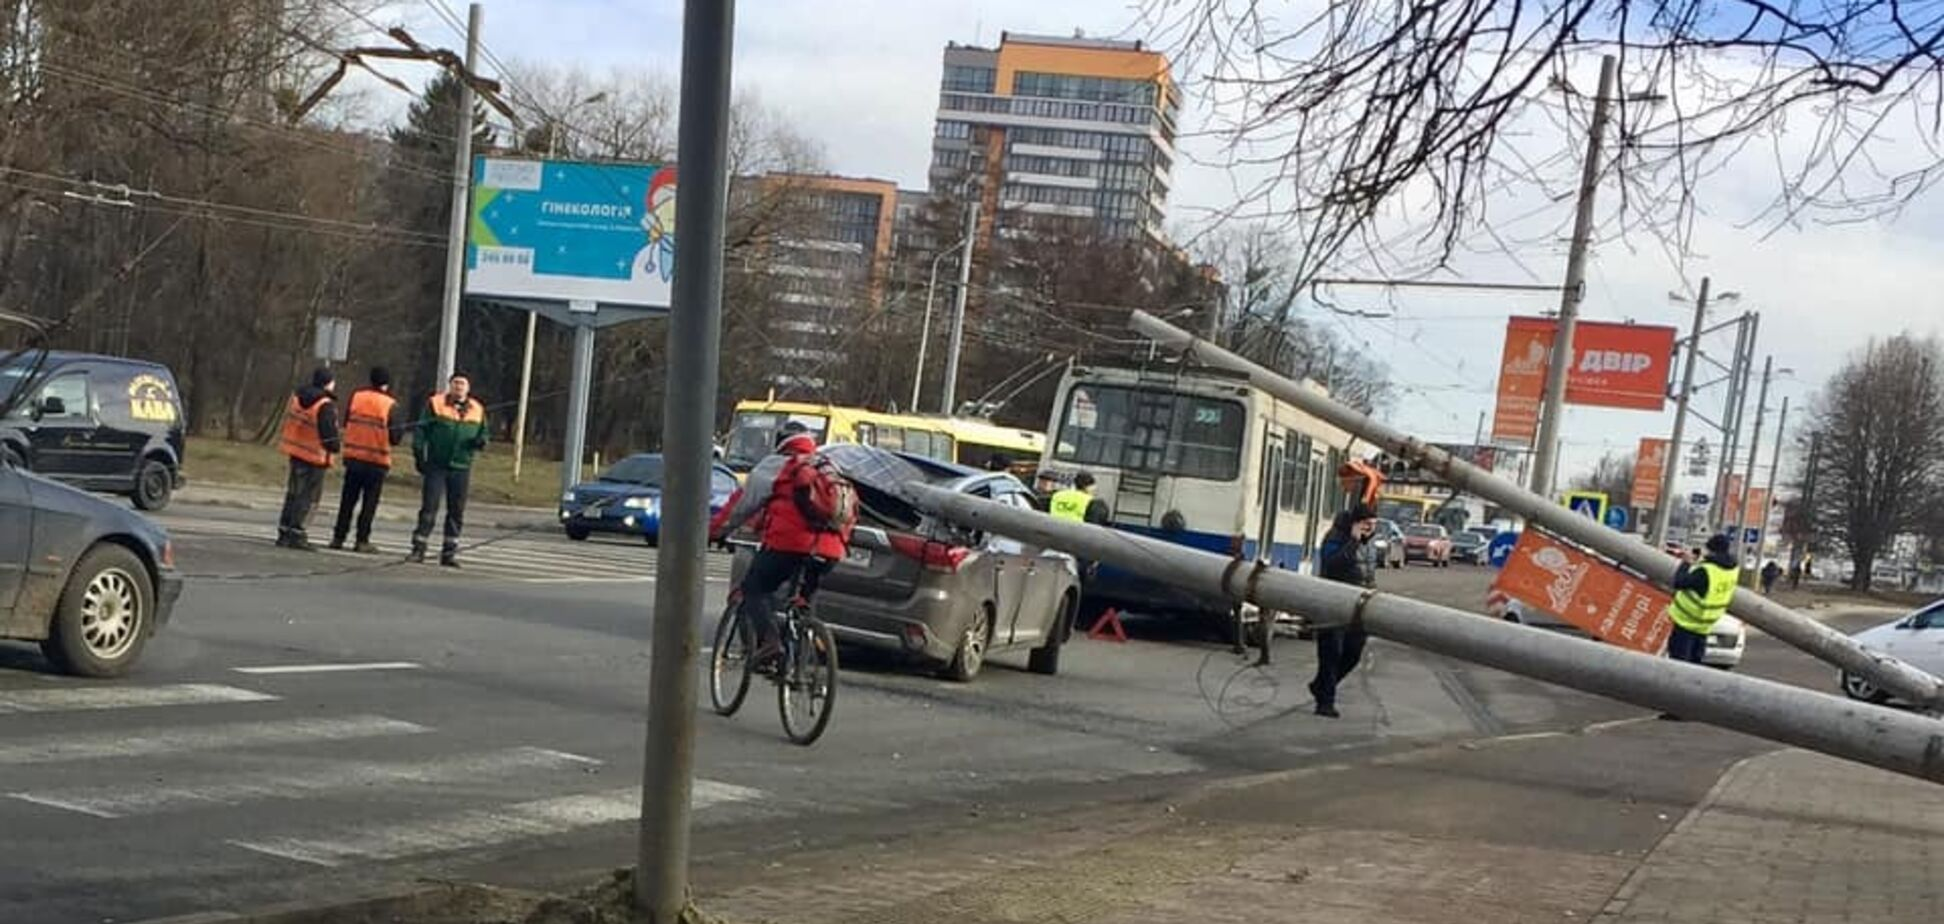 Во Львове электроопора 'раздавила' легковушку и троллейбус с людьми: фото и видео с места ЧП